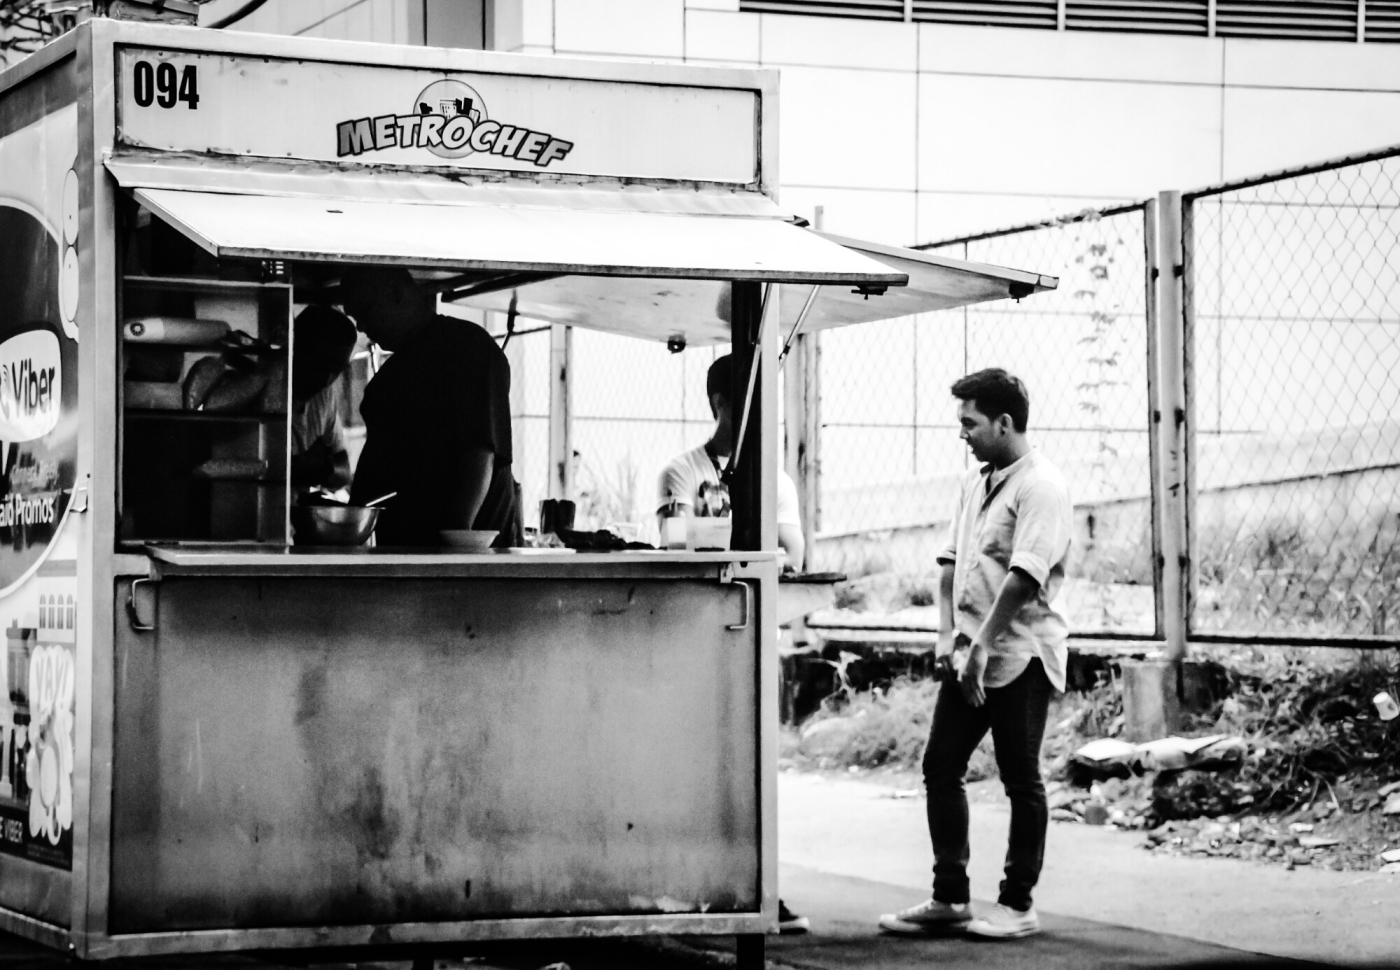 The Makati JolliJeep (Metrochef) – Photo ni Ompong